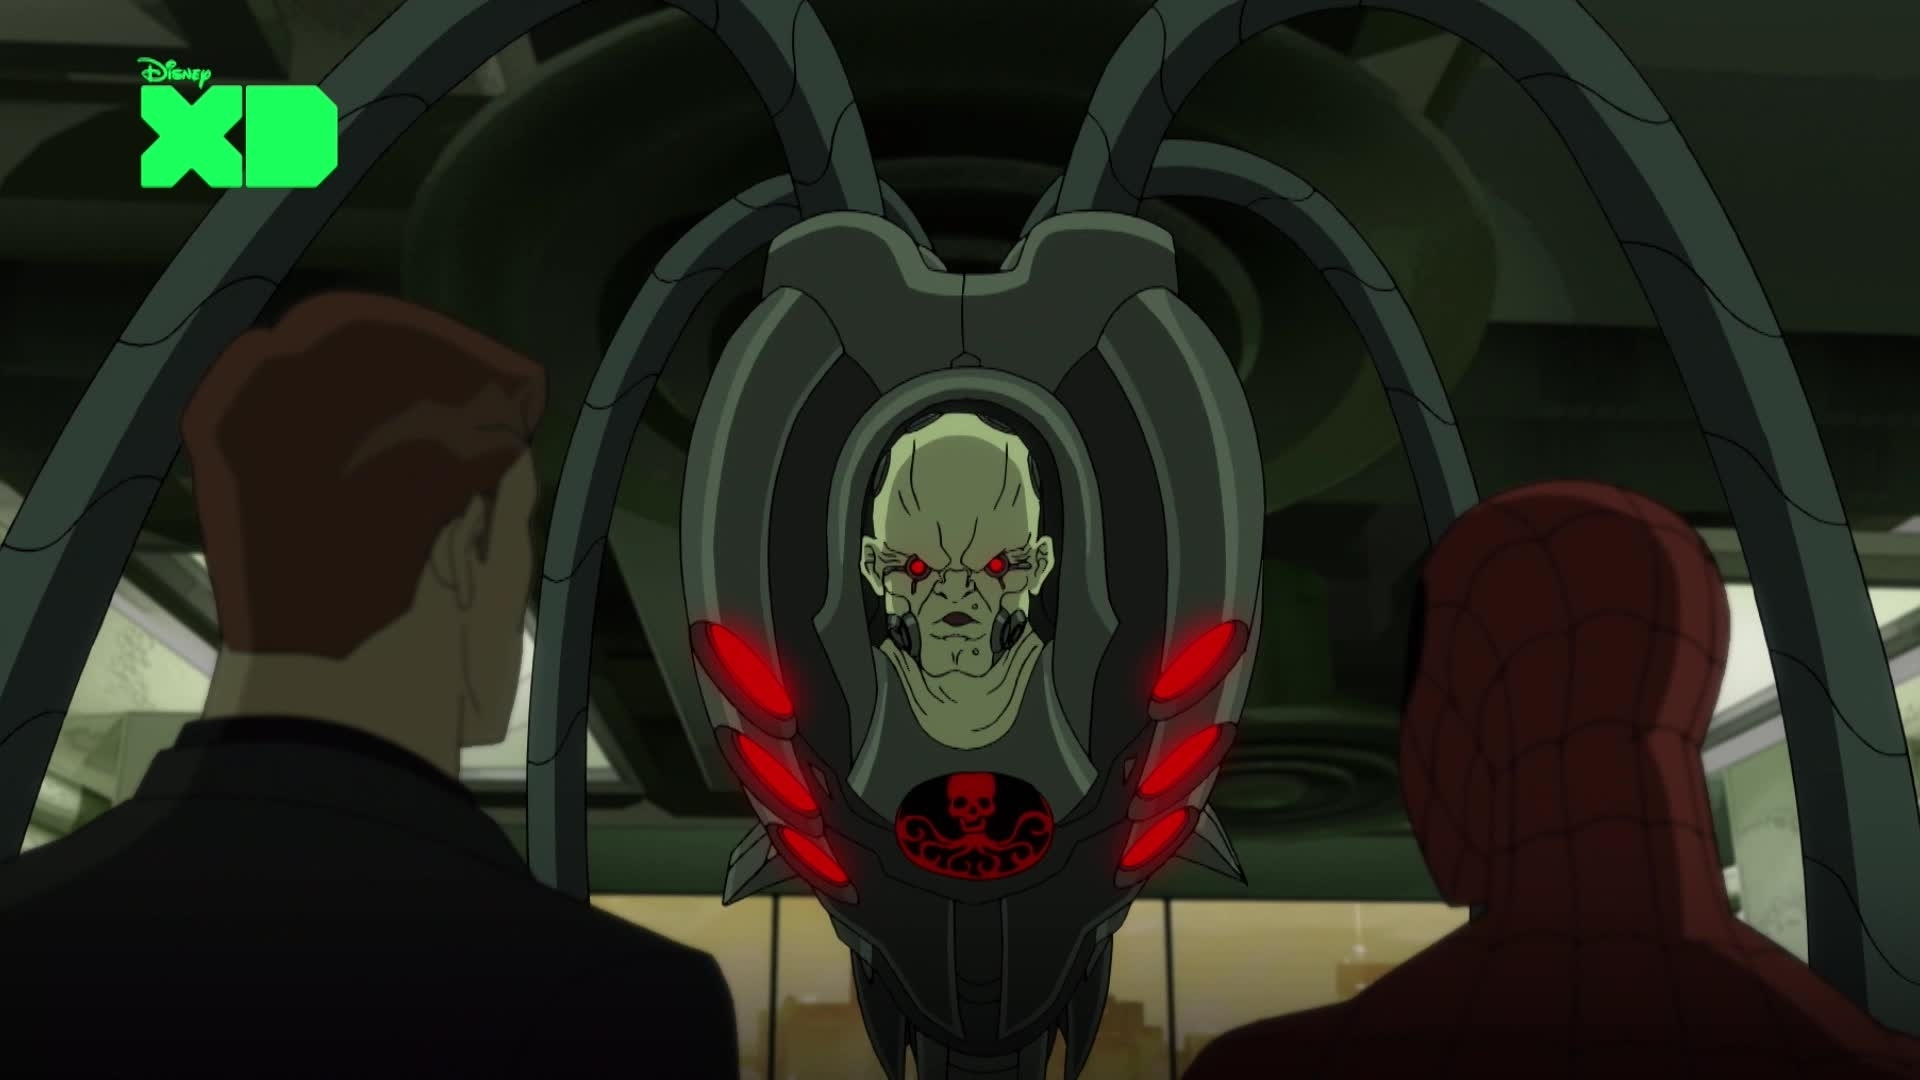 Hydra ataca: 2ª parte